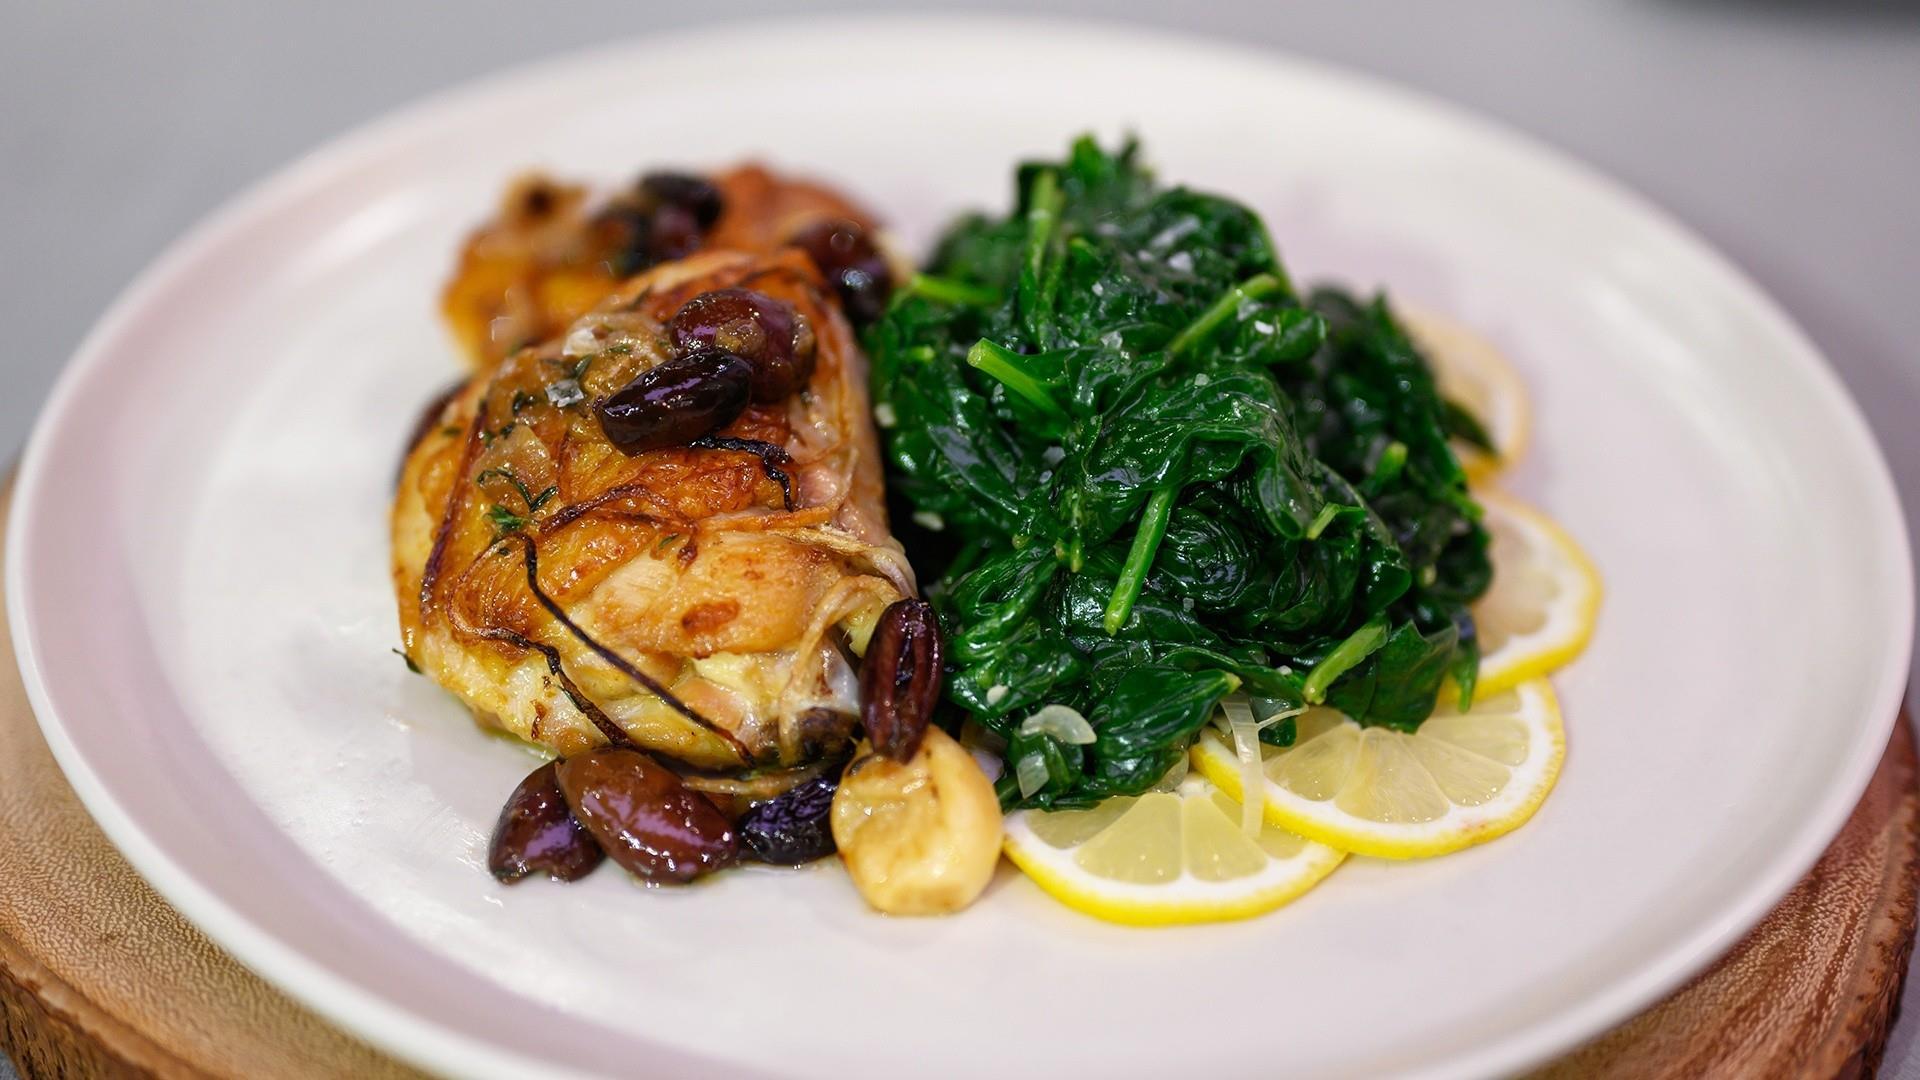 Entertaining recipes: Make Valerie Bertinelli's garlic chicken